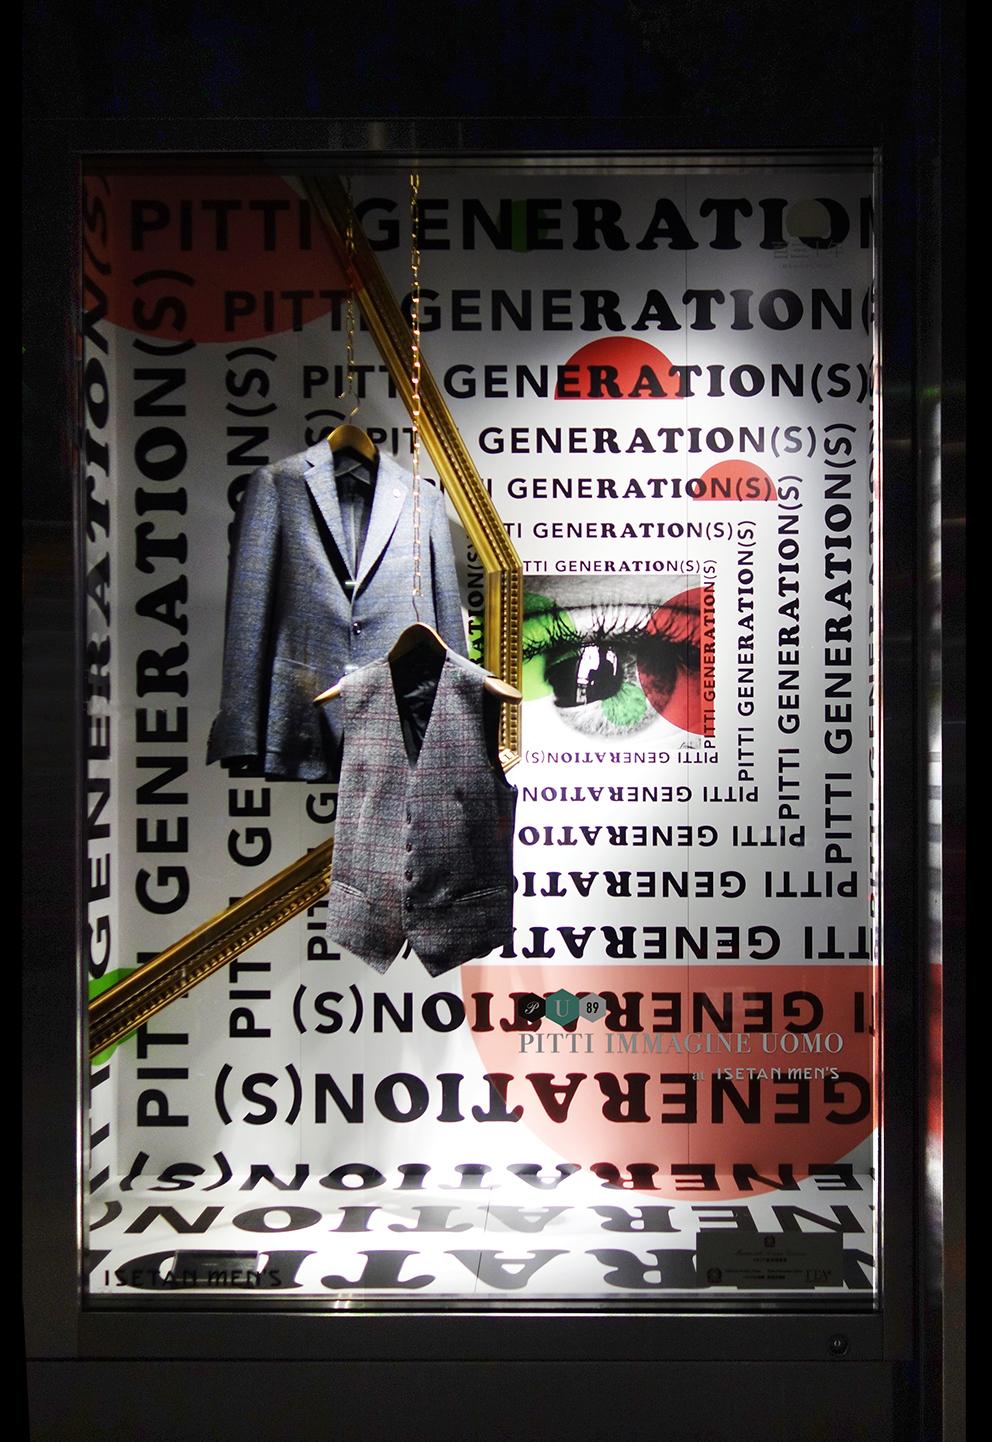 PITTI GENERATION(S) (Pitti Immagine Uomo 89)